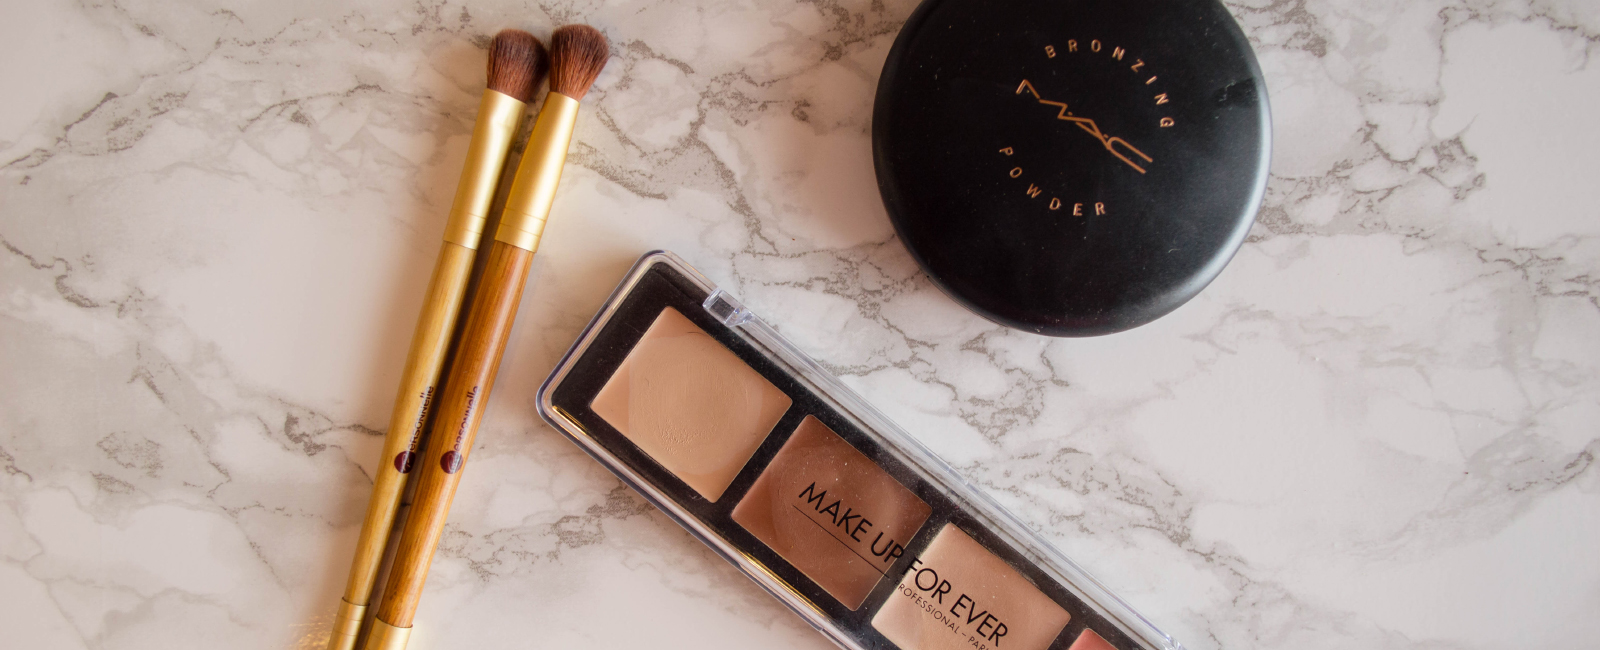 Spring Makeup Wishlist